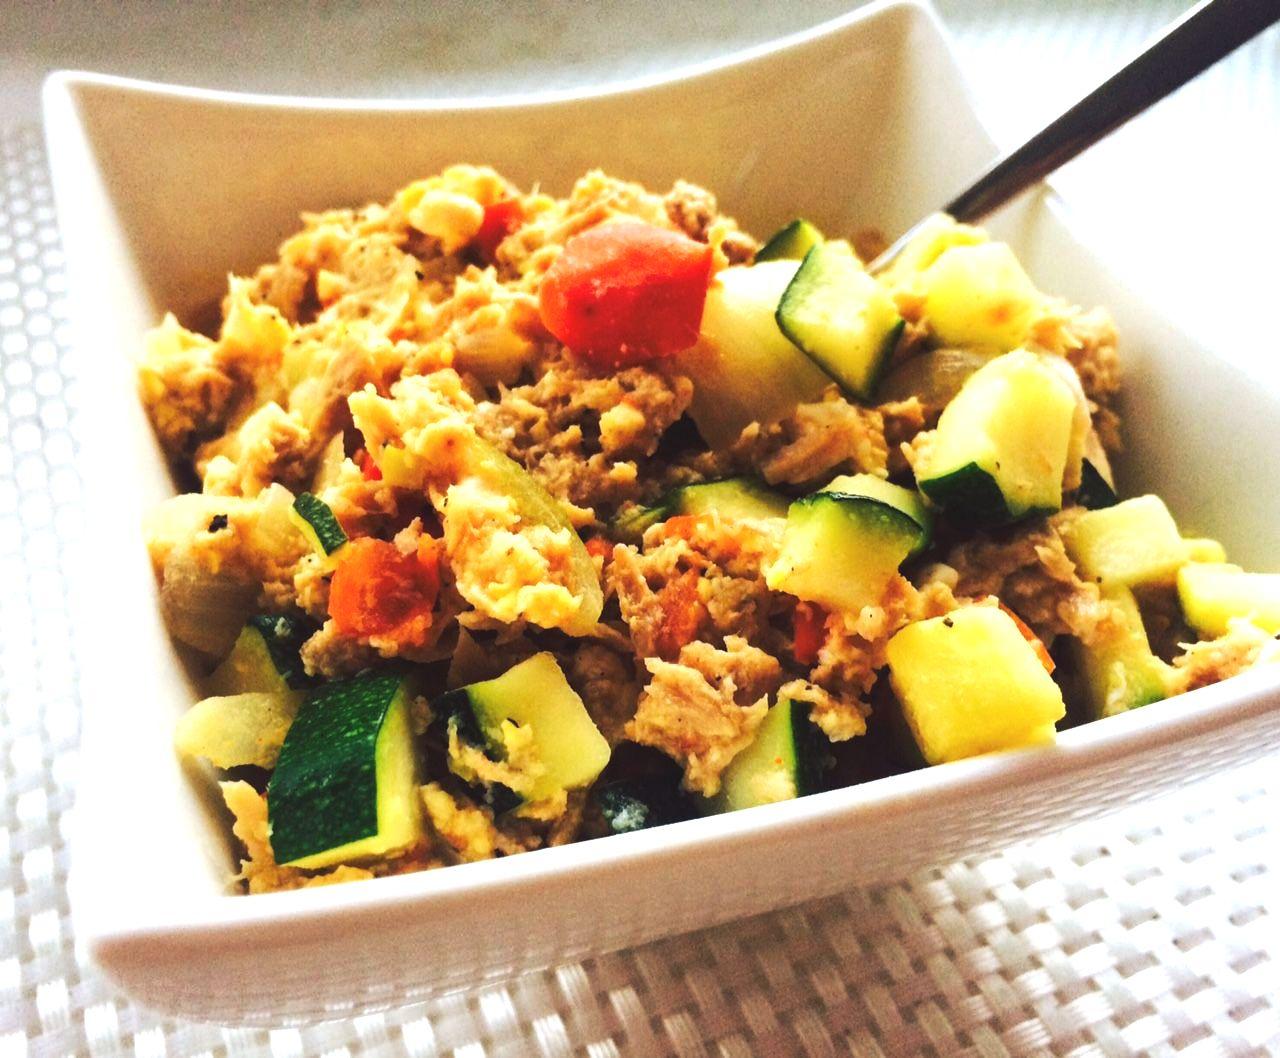 Rezepte Leichte Küche Ohne Kohlenhydrate | Low Carb Brot Glutenfrei ...